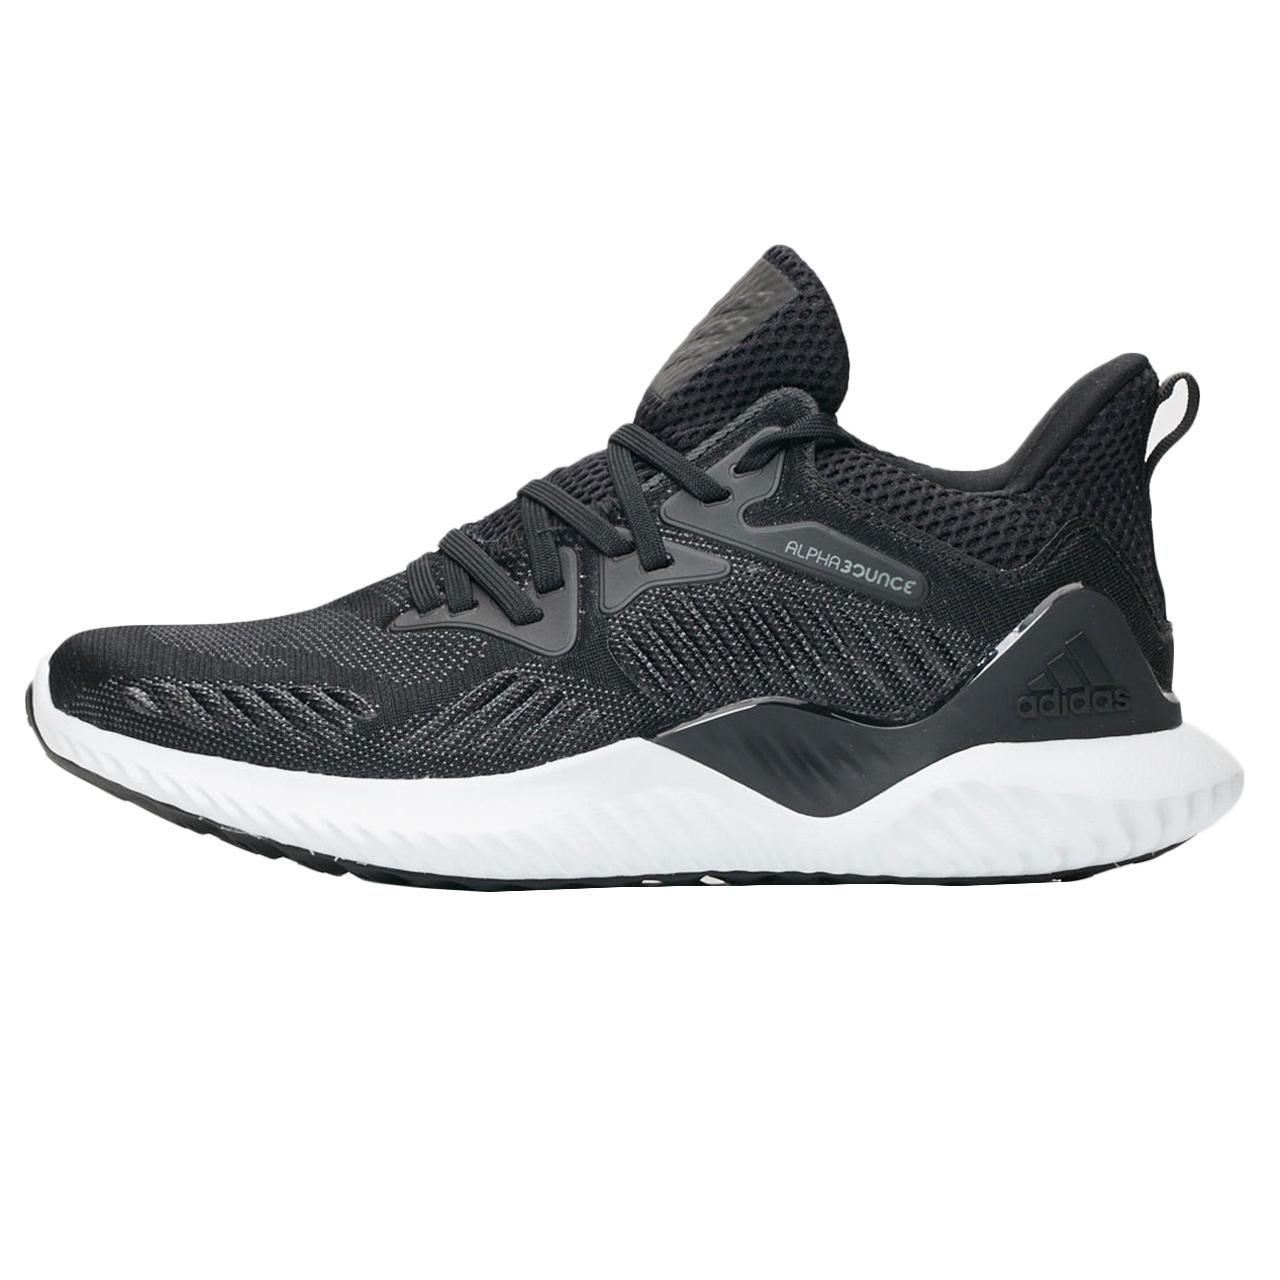 کفش مخصوص دویدن مردانه آدیداس مدل Alphabounce EM کد TB00987N